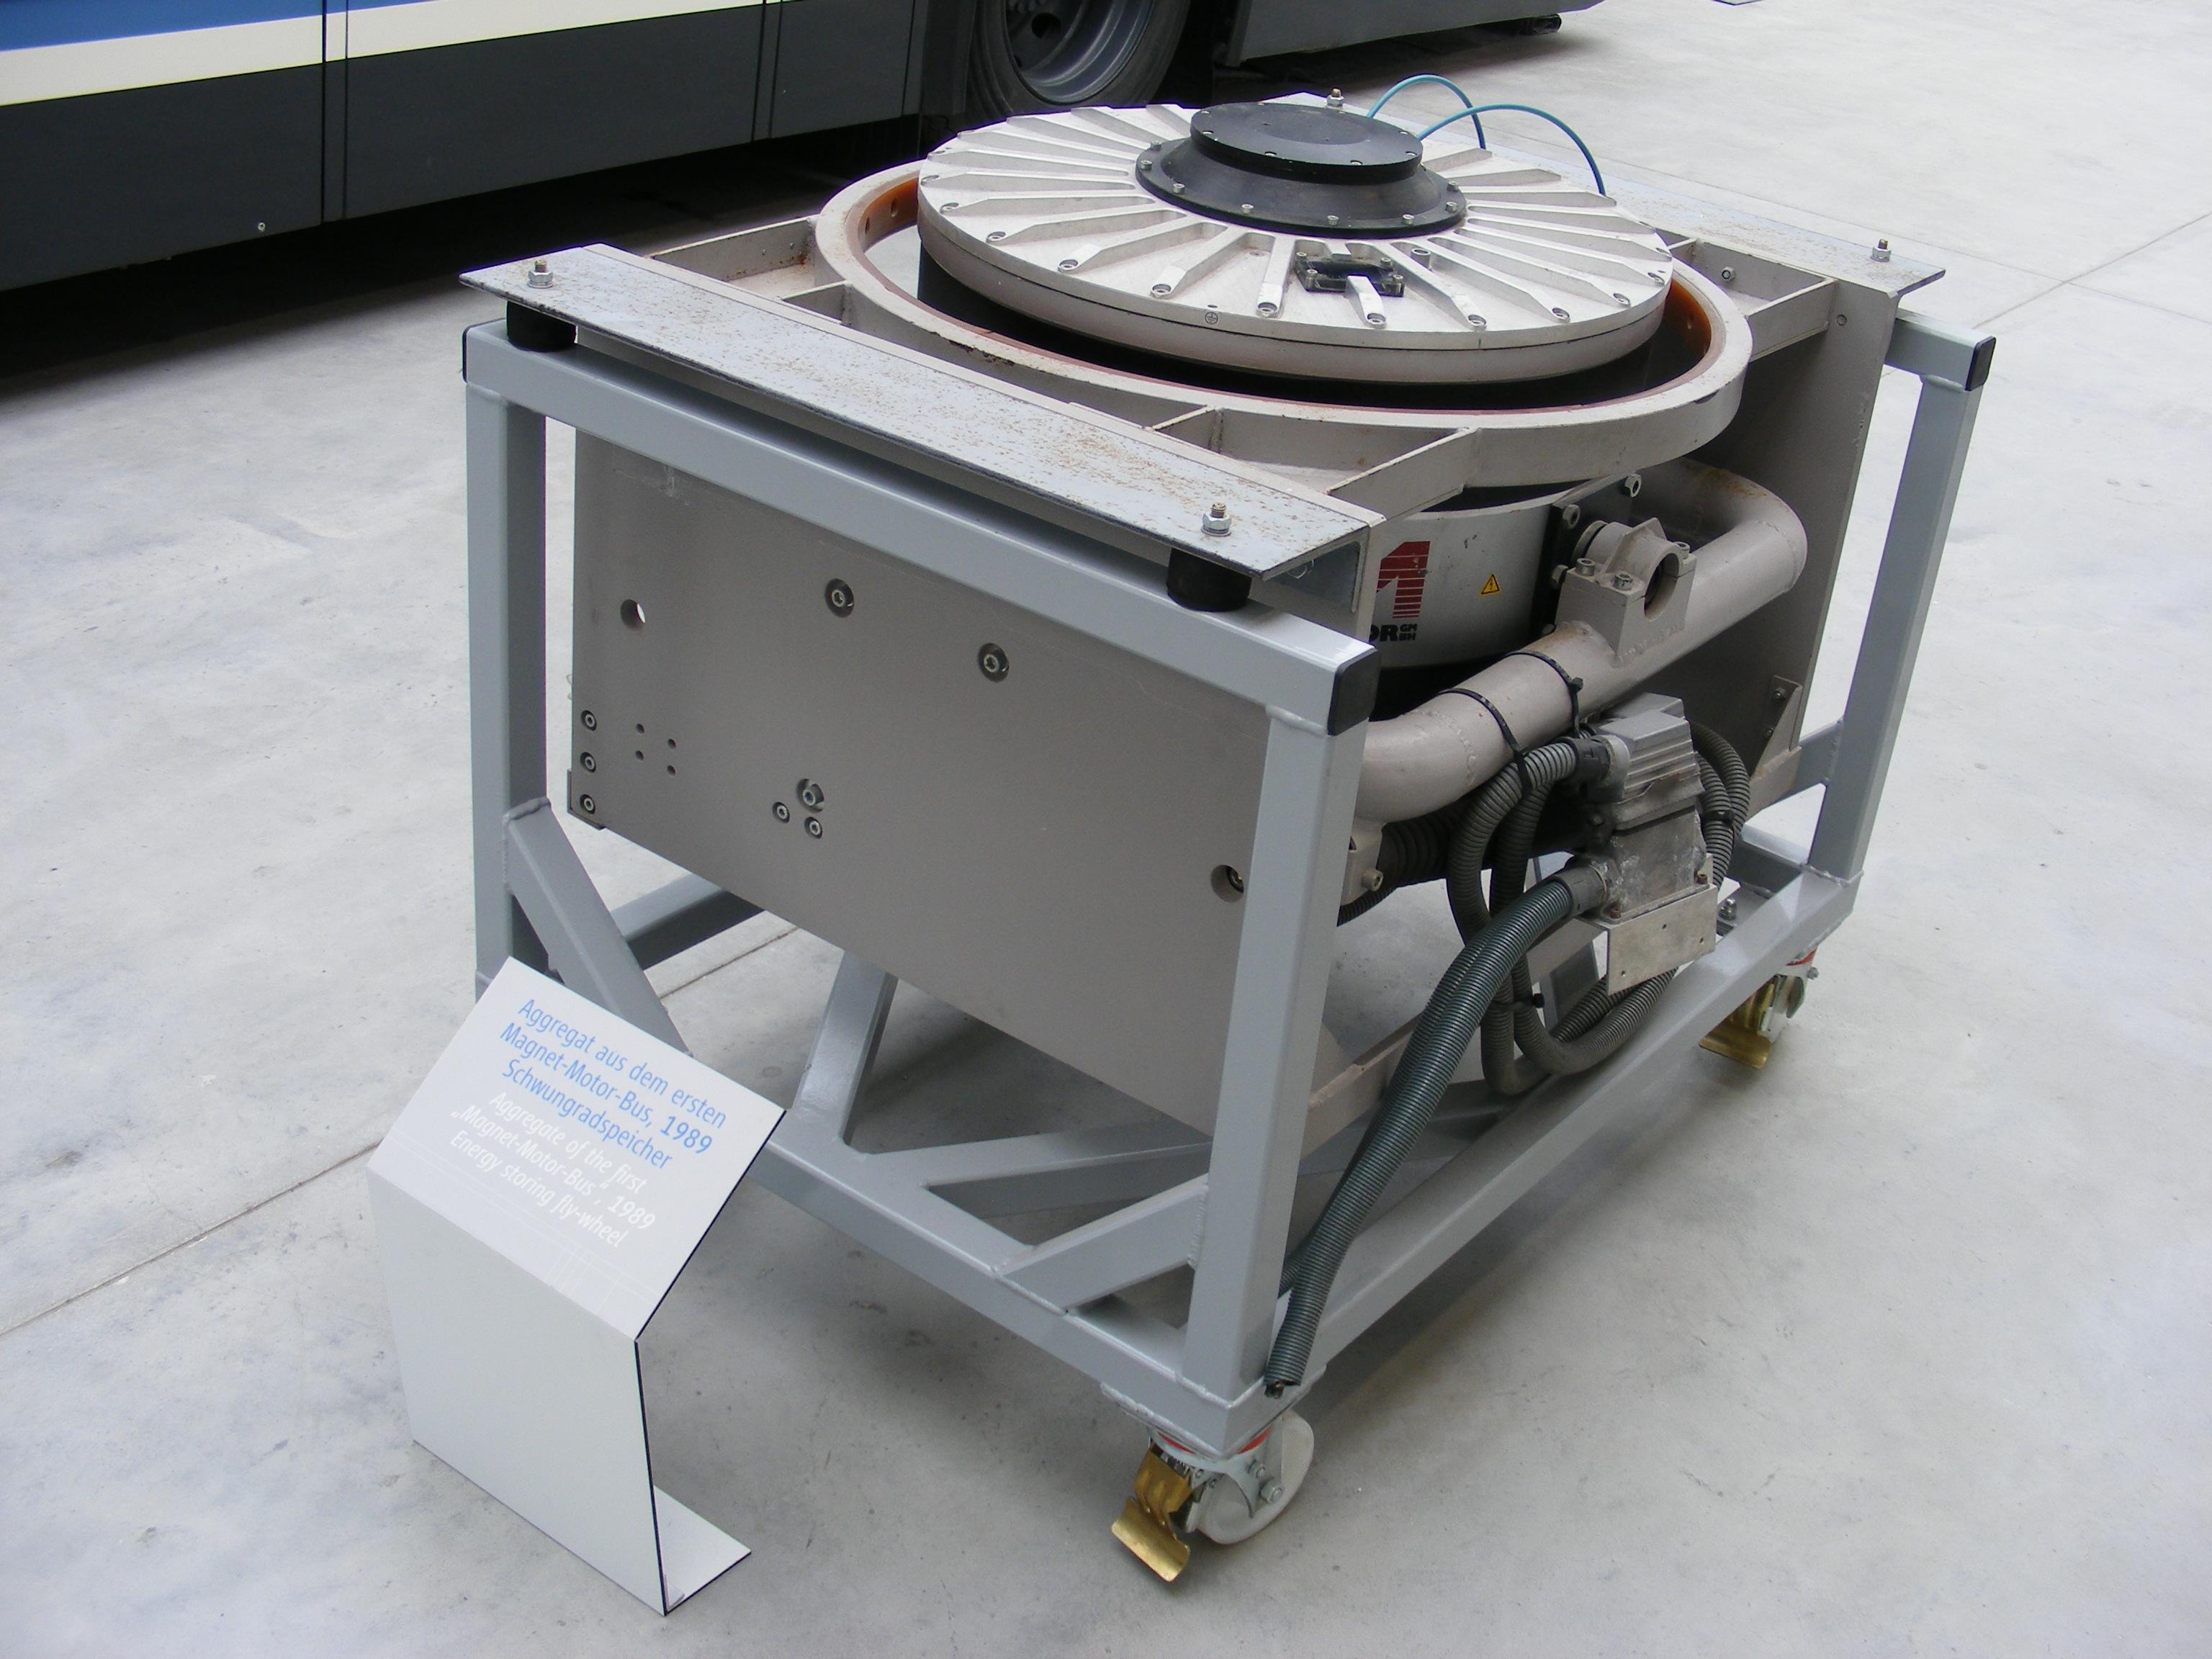 Description Schwungradspeicher (Magnet Motor), Bj. 1989 - Exponat im ...